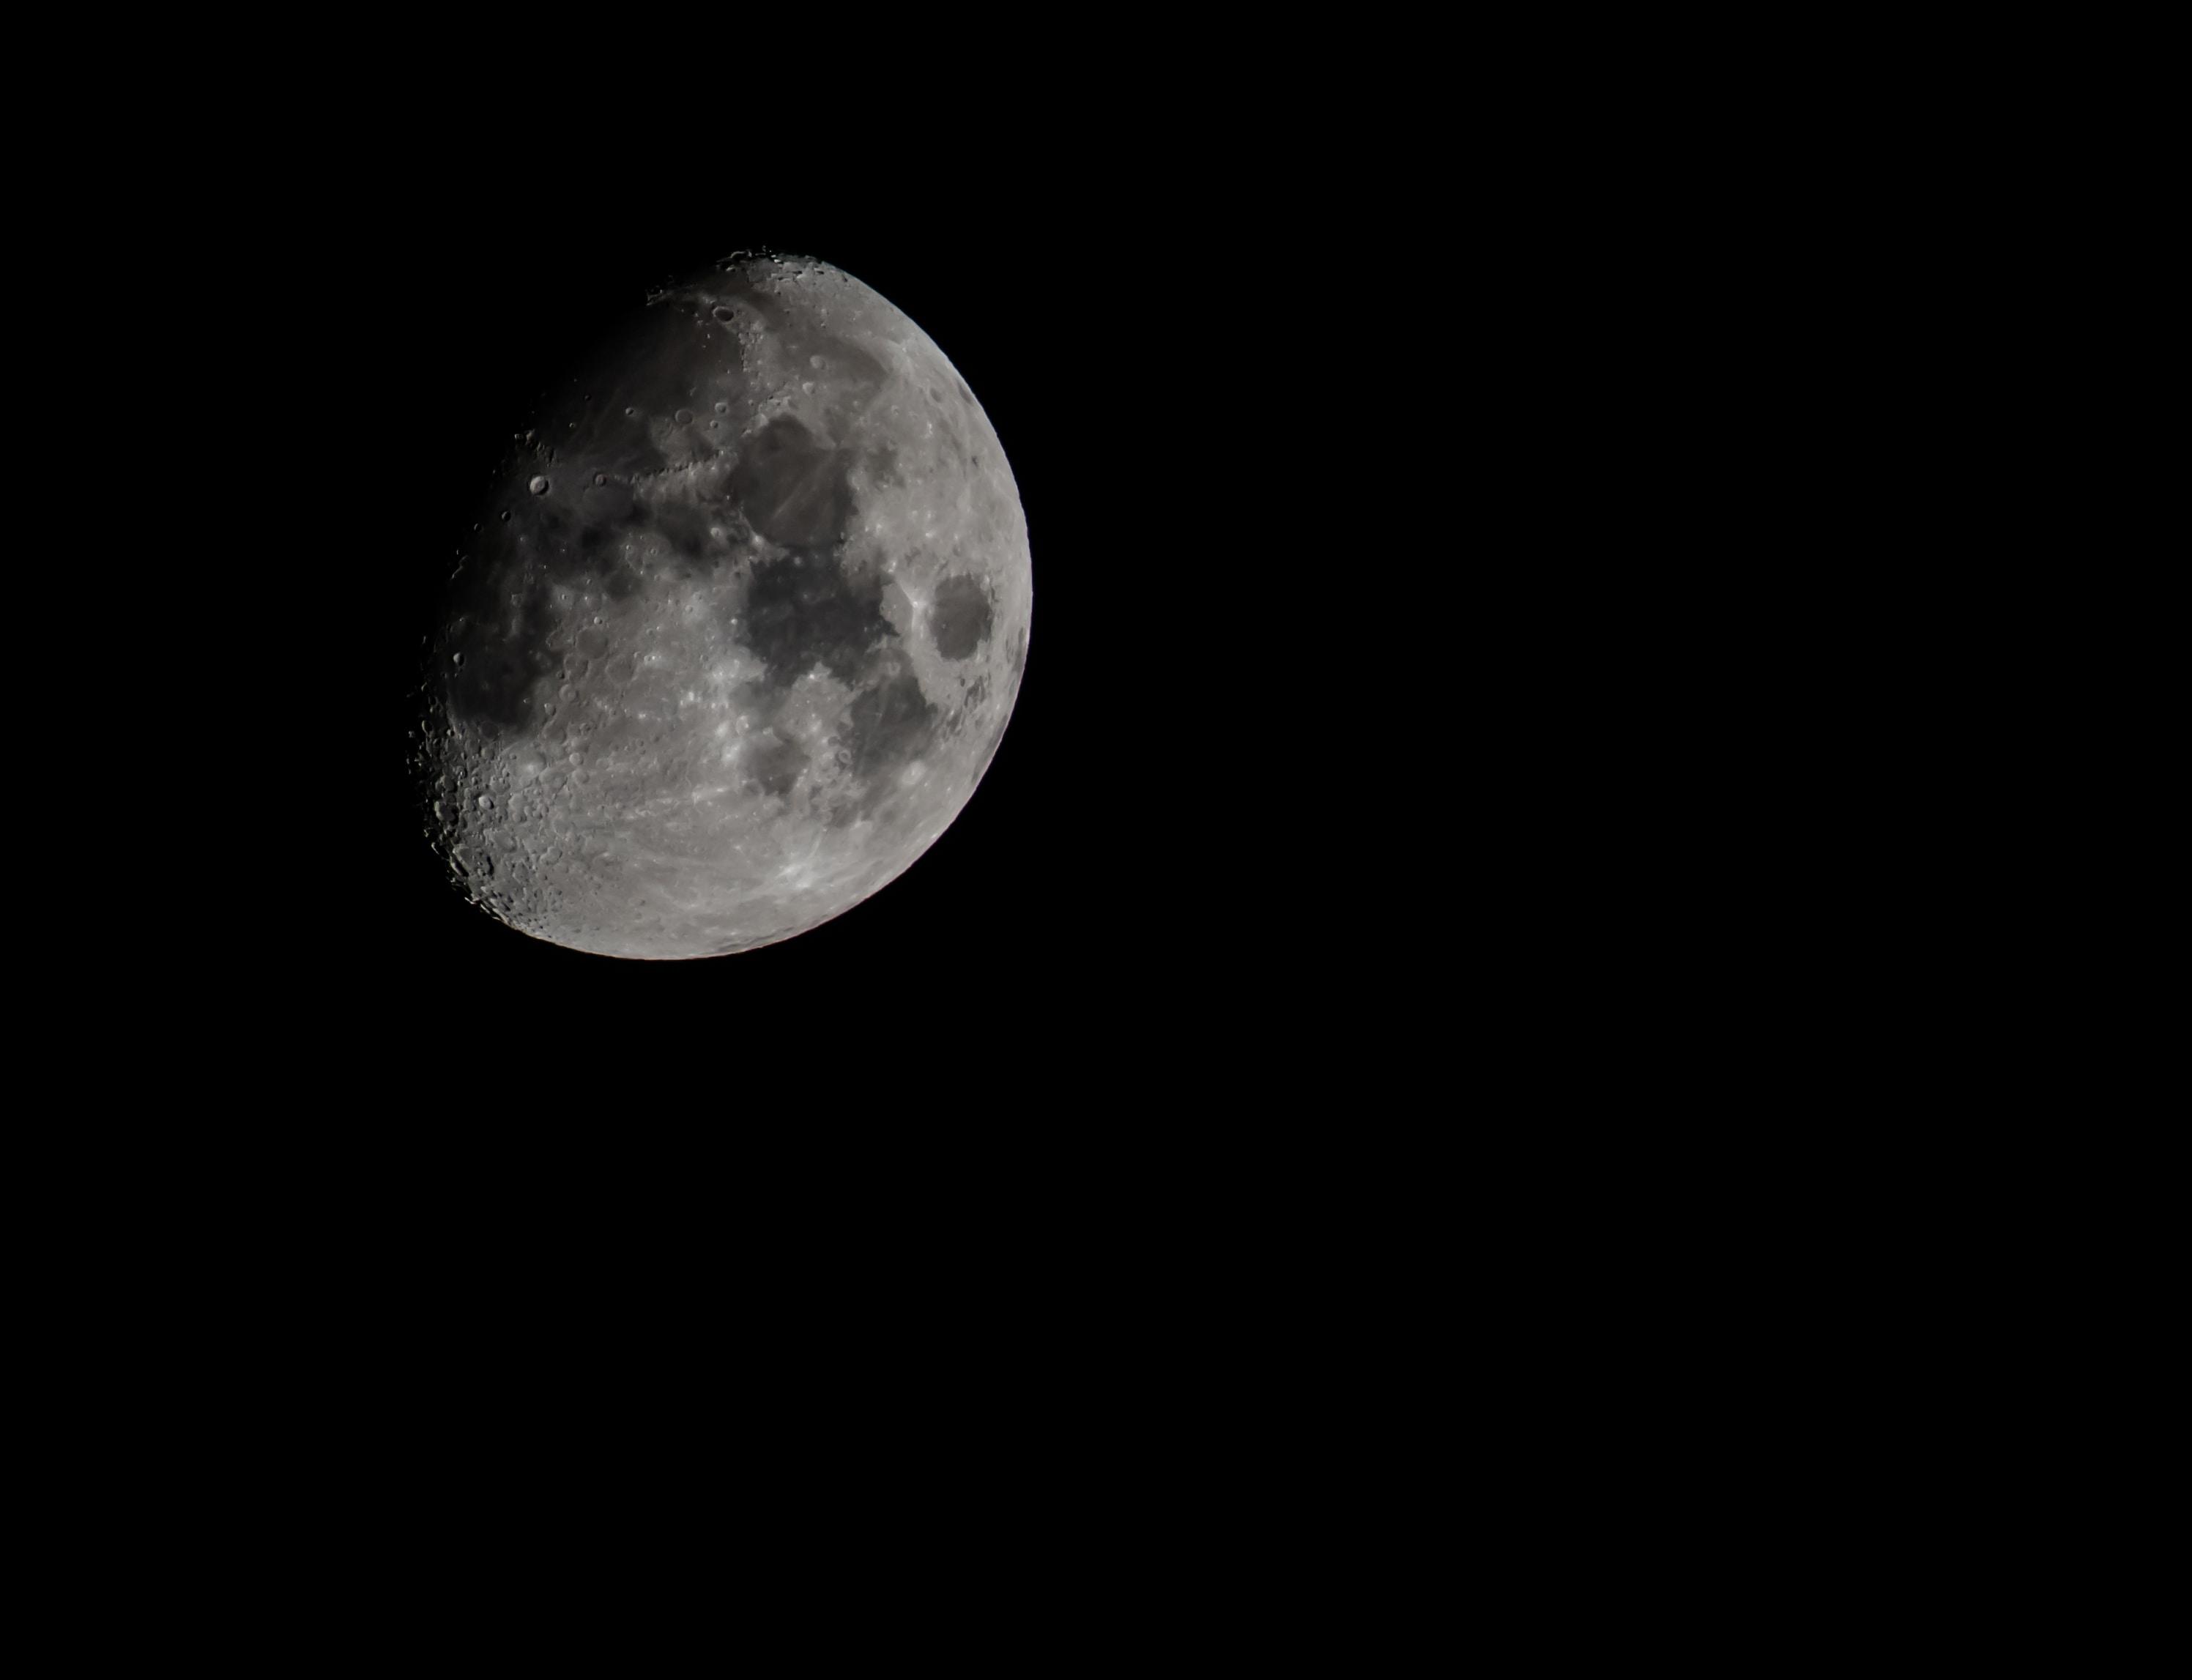 closeup moon photography